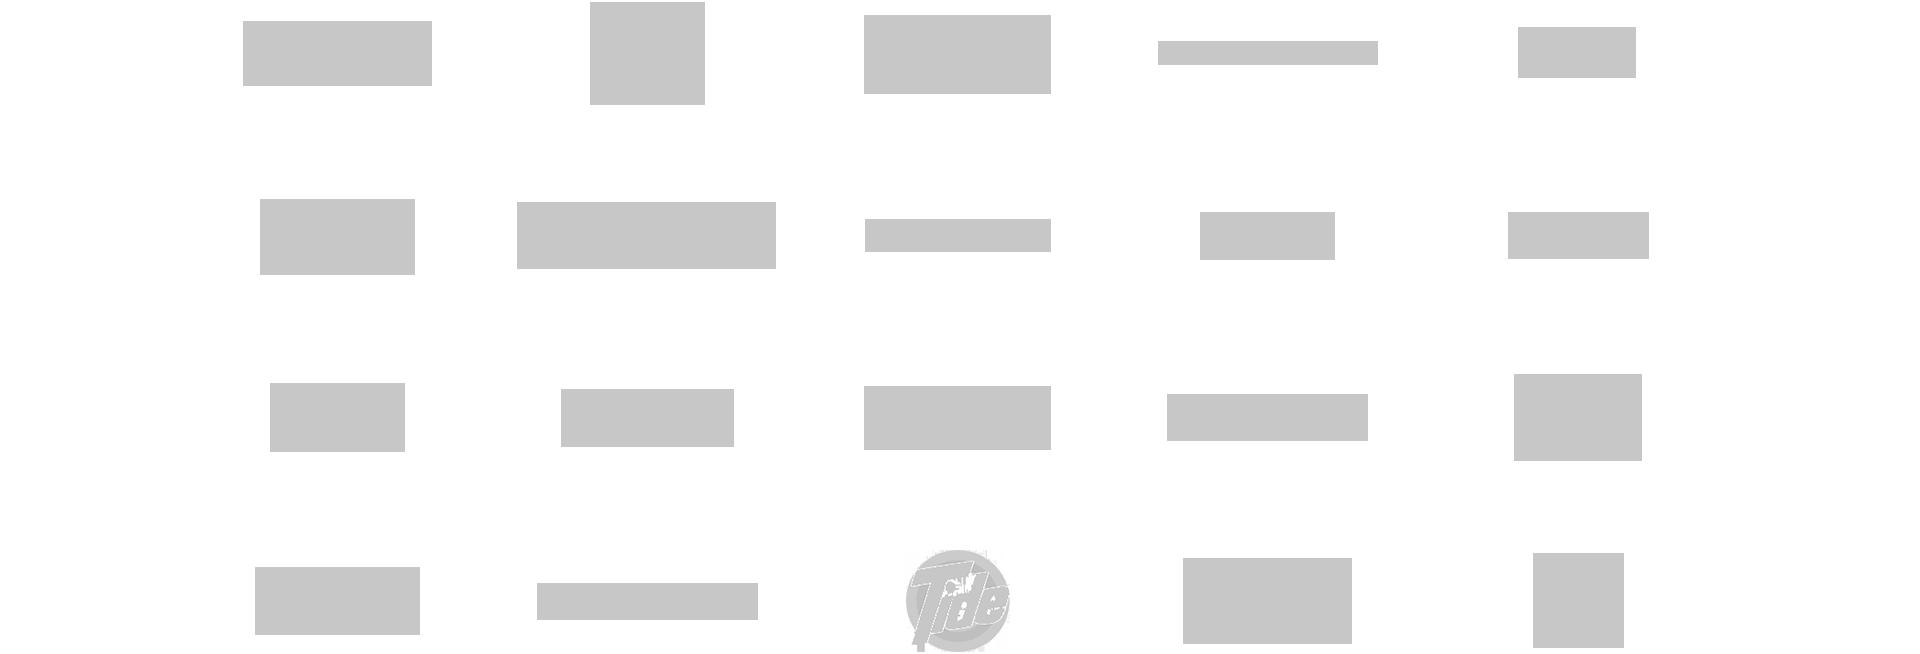 sl-logos-003